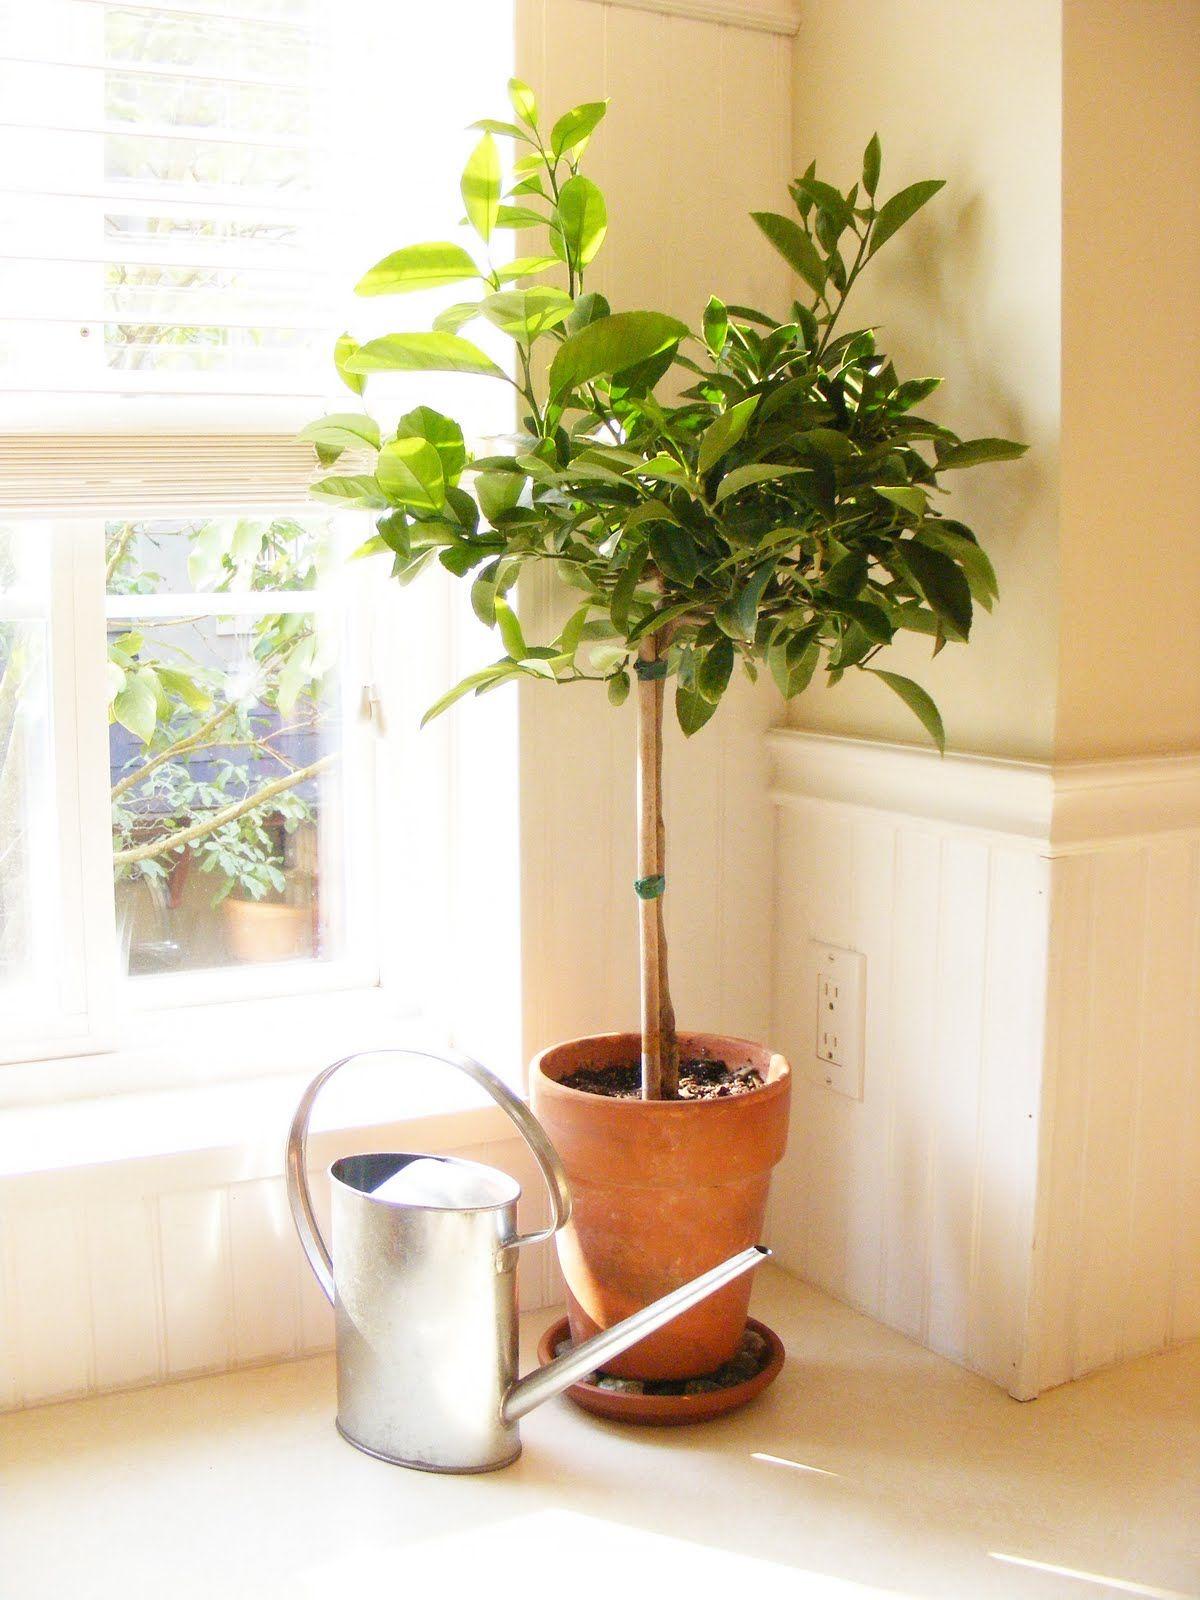 how to transition tropical plants indoors meyer lemon tree plants and gardens. Black Bedroom Furniture Sets. Home Design Ideas